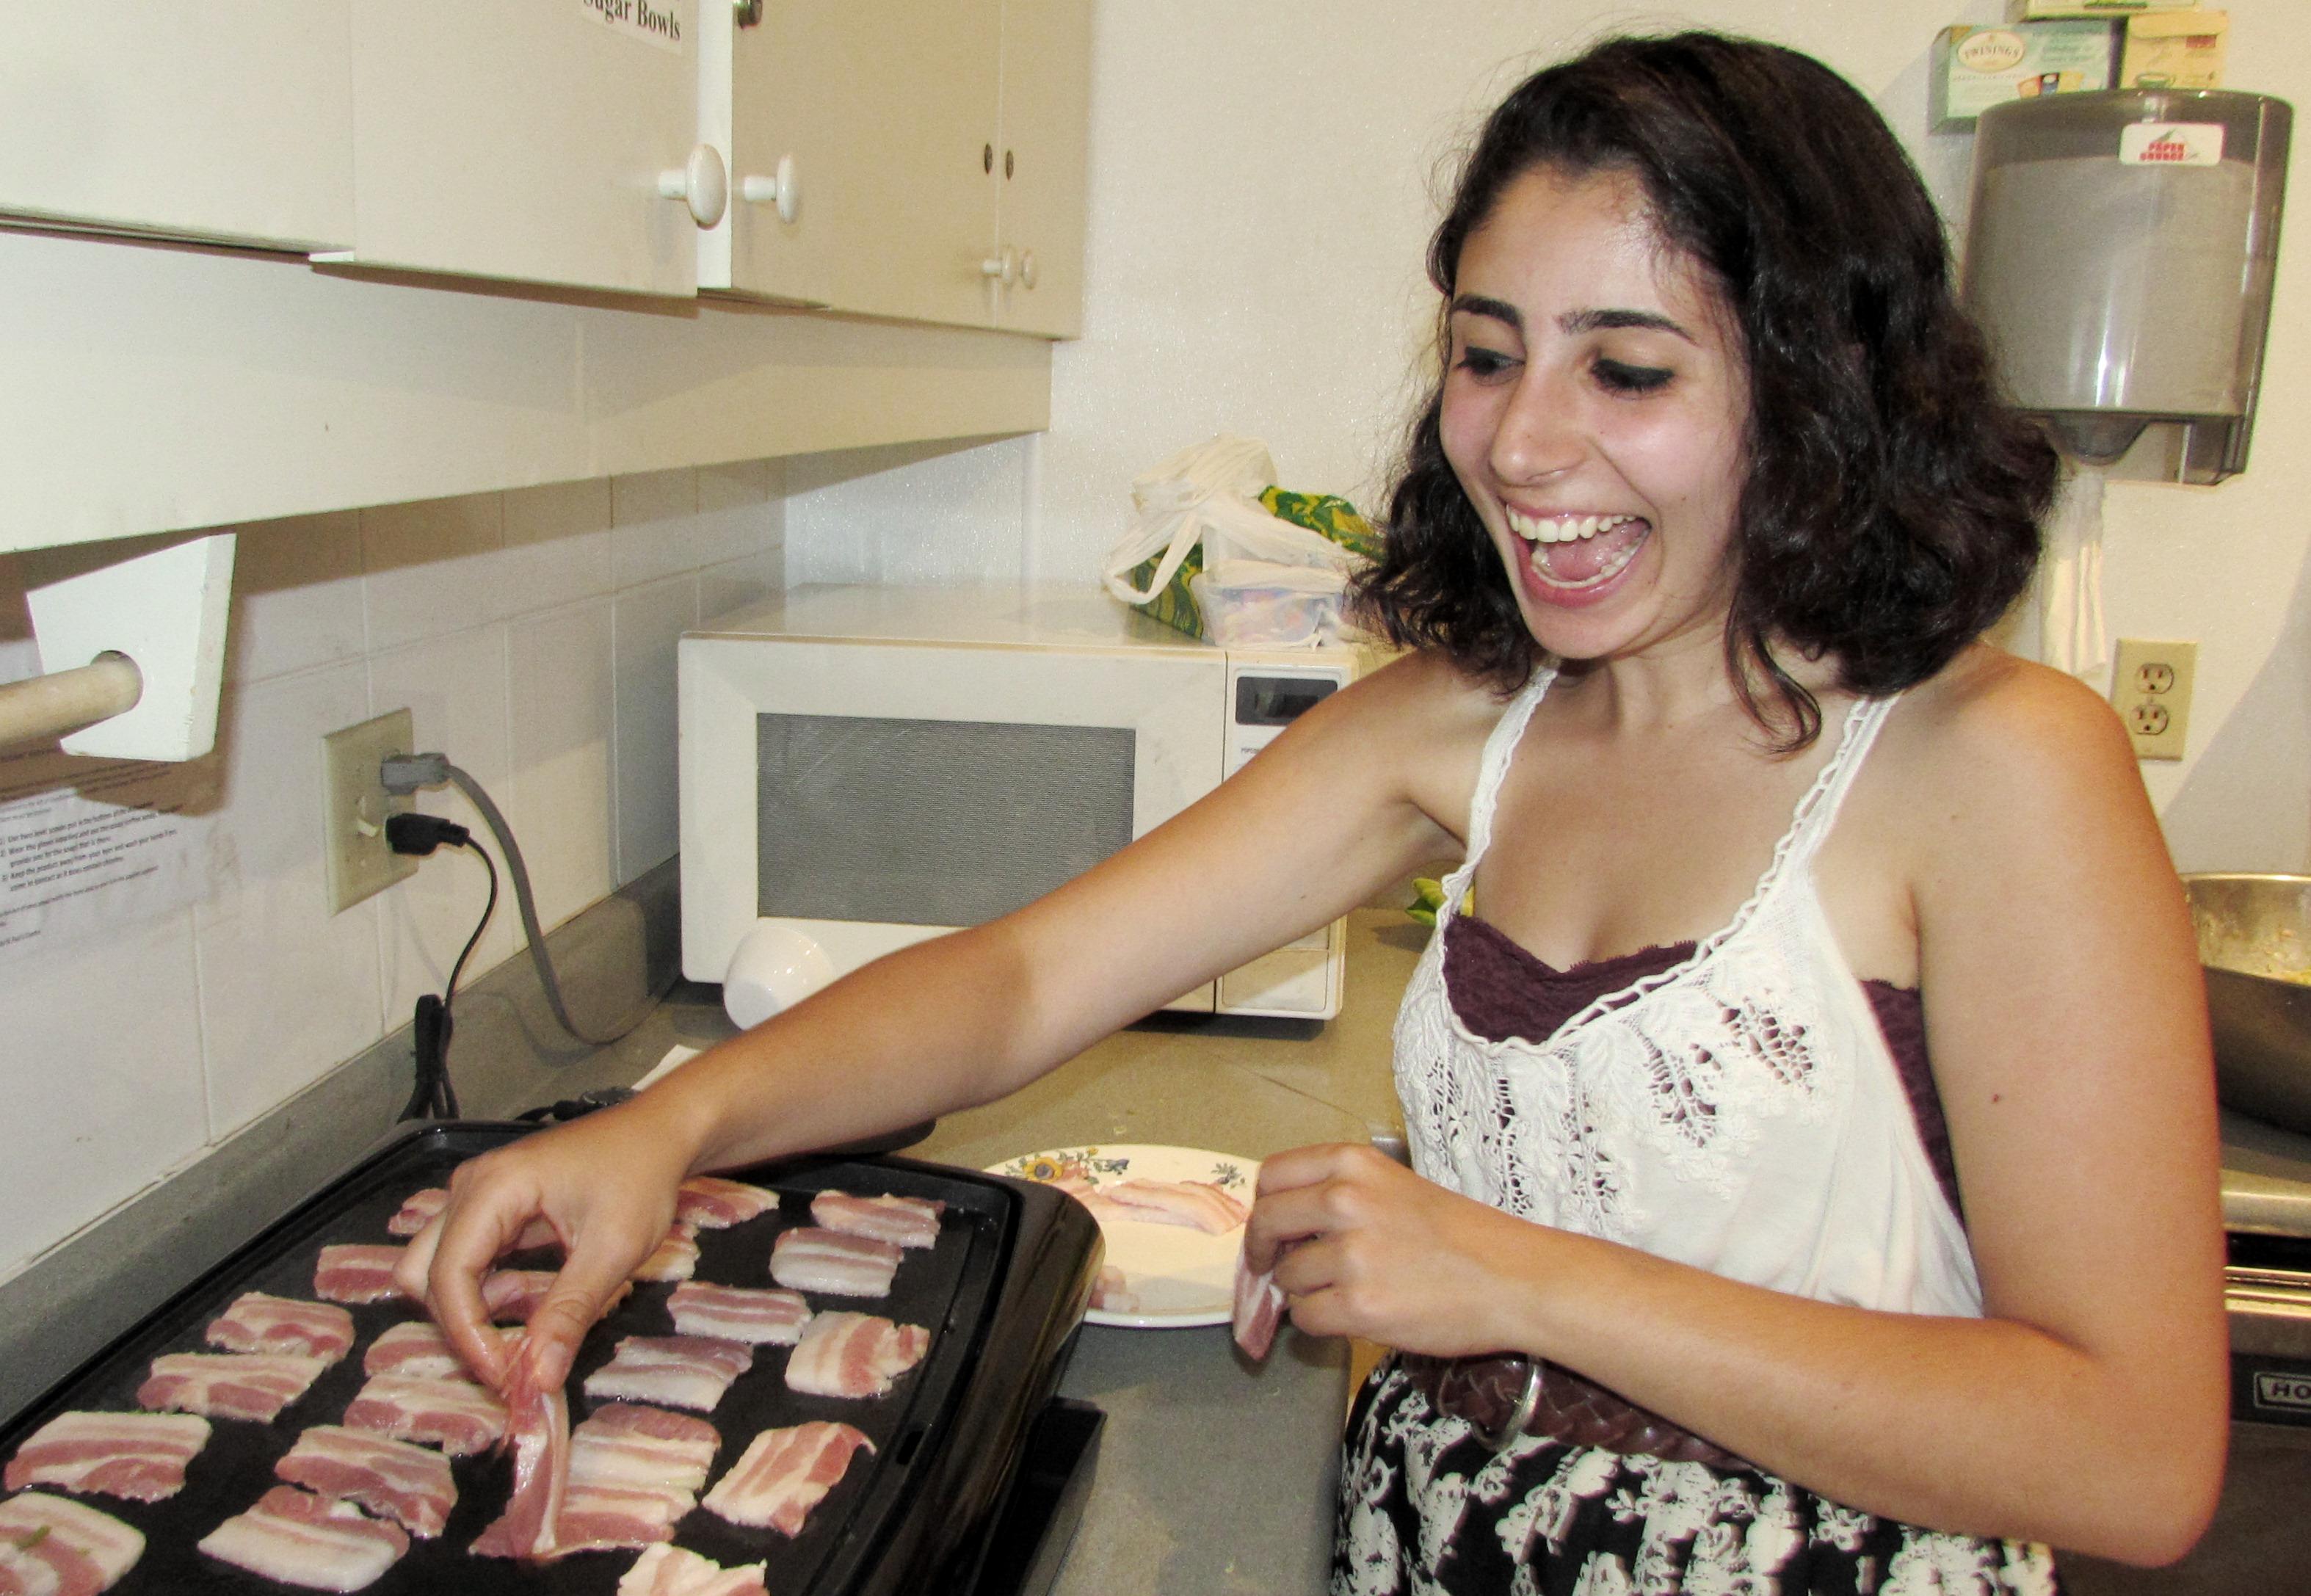 Cooking up the okonomiyaki bacon toppings